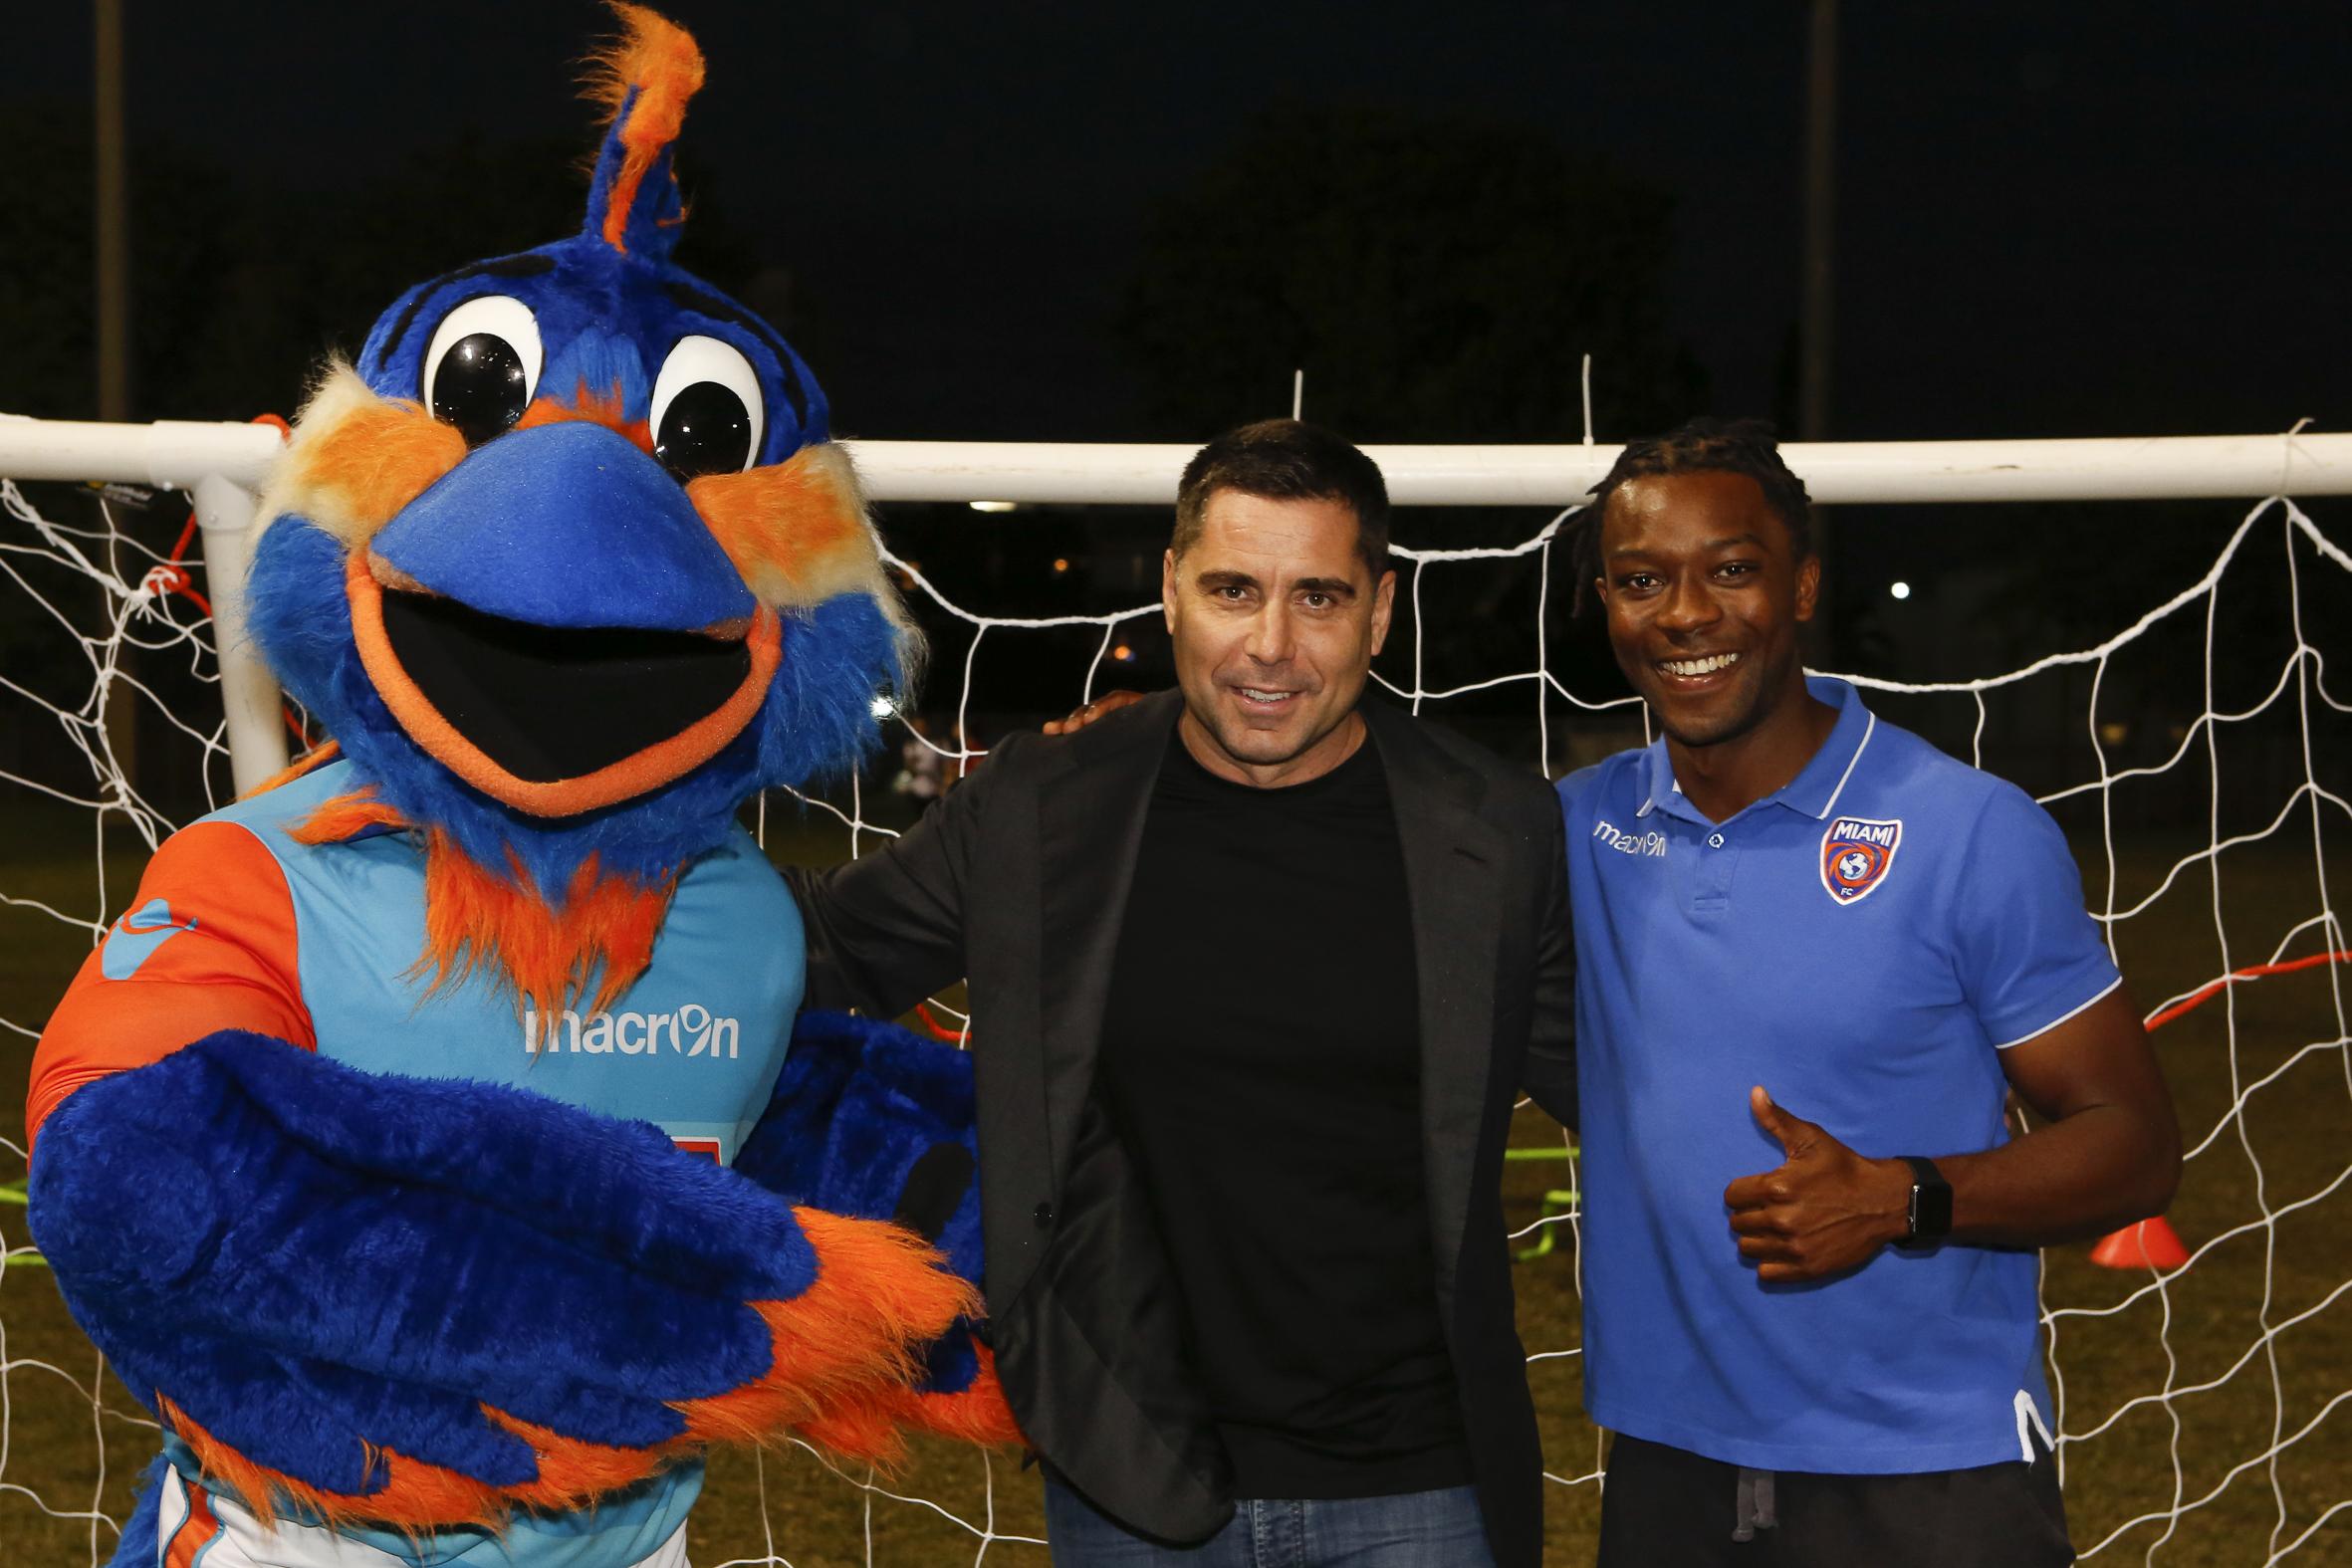 Riccardo Silva with Miami FC mascot Golazo and captain Michael Lahoud